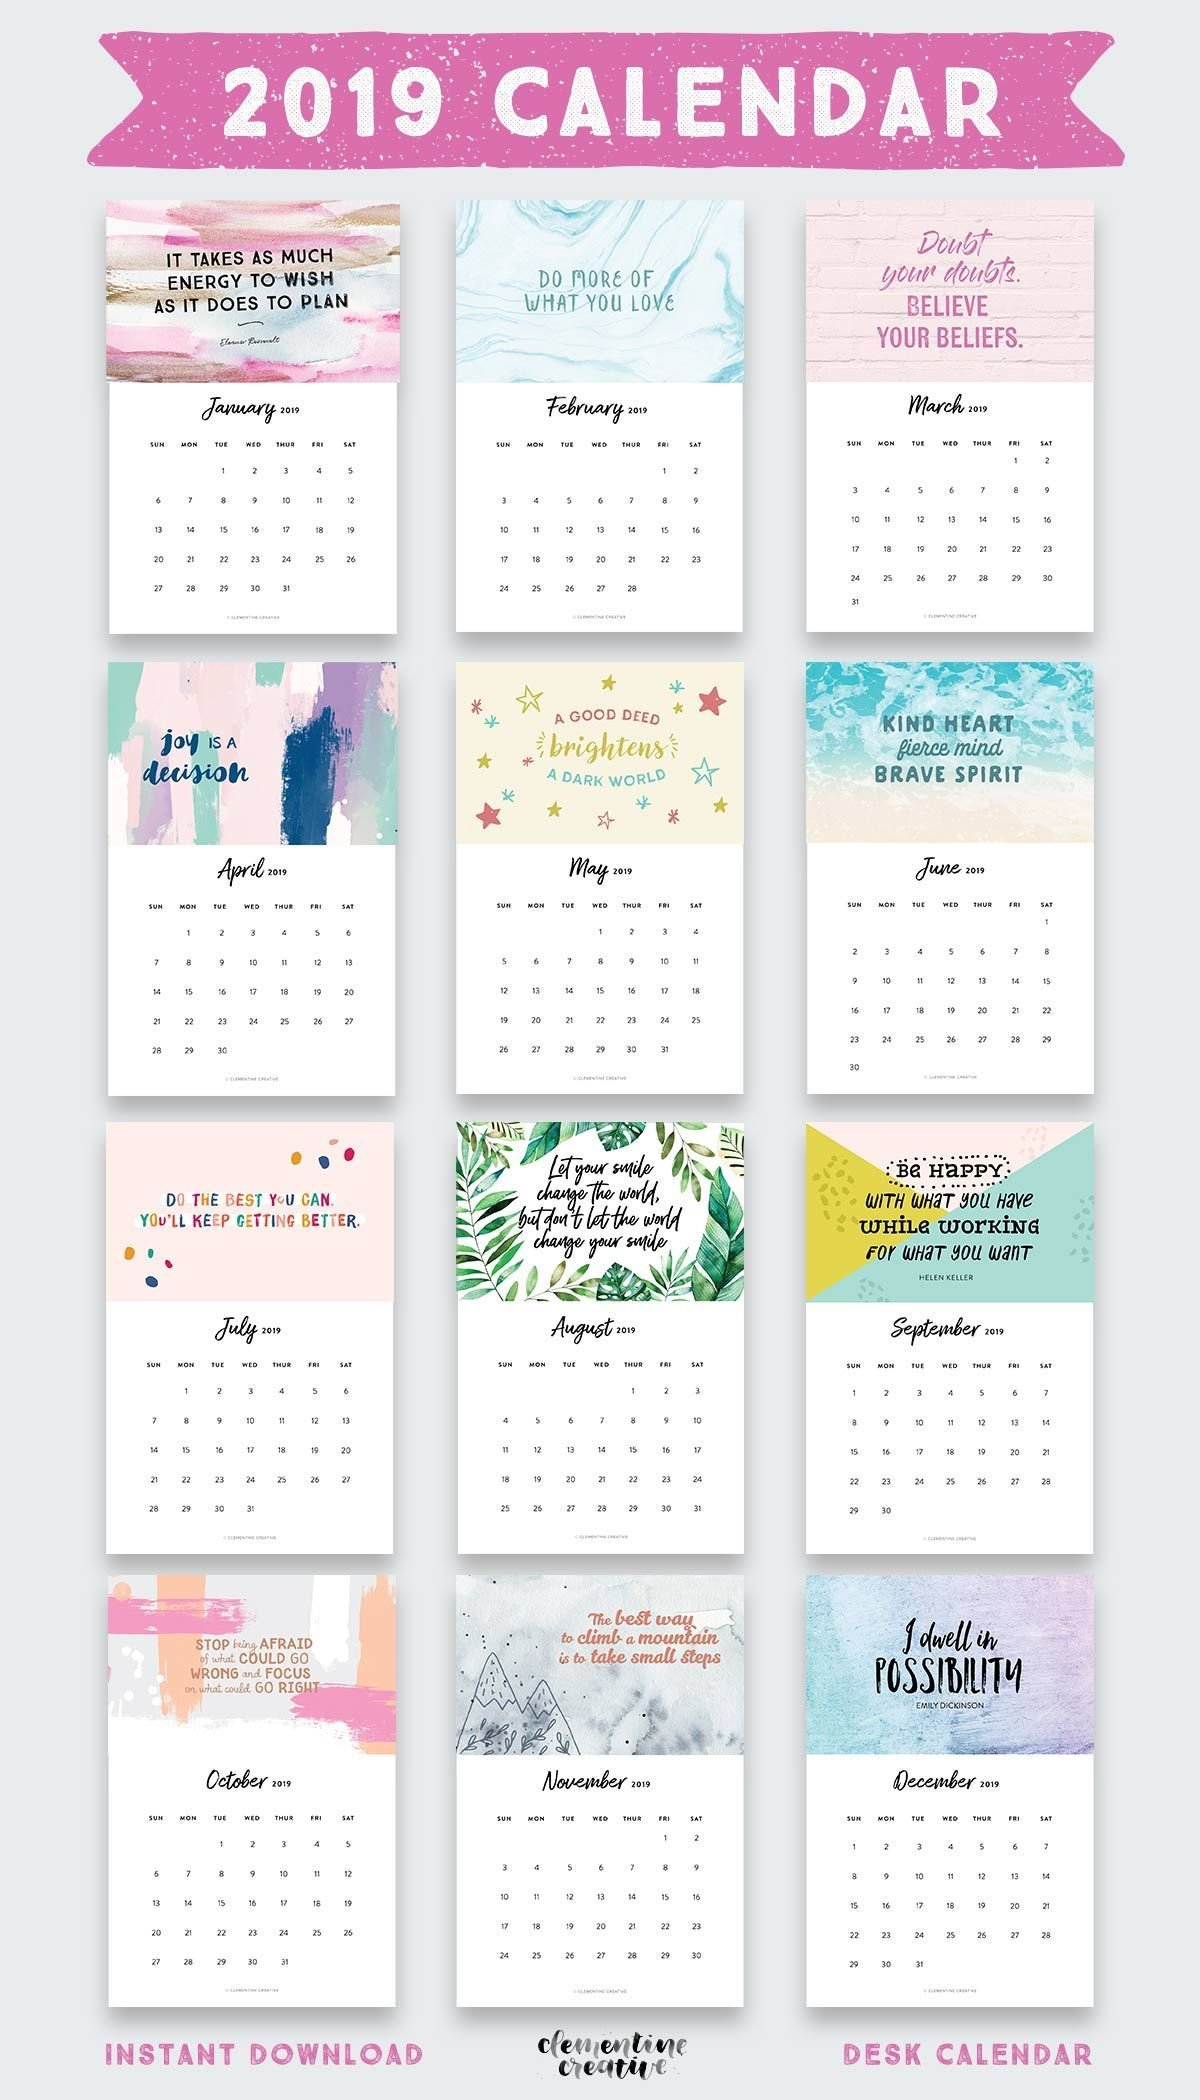 Printable 2019 Inspirational Quotes Calendar | Graphic Design | Desk Calendar 2019 Inspirational